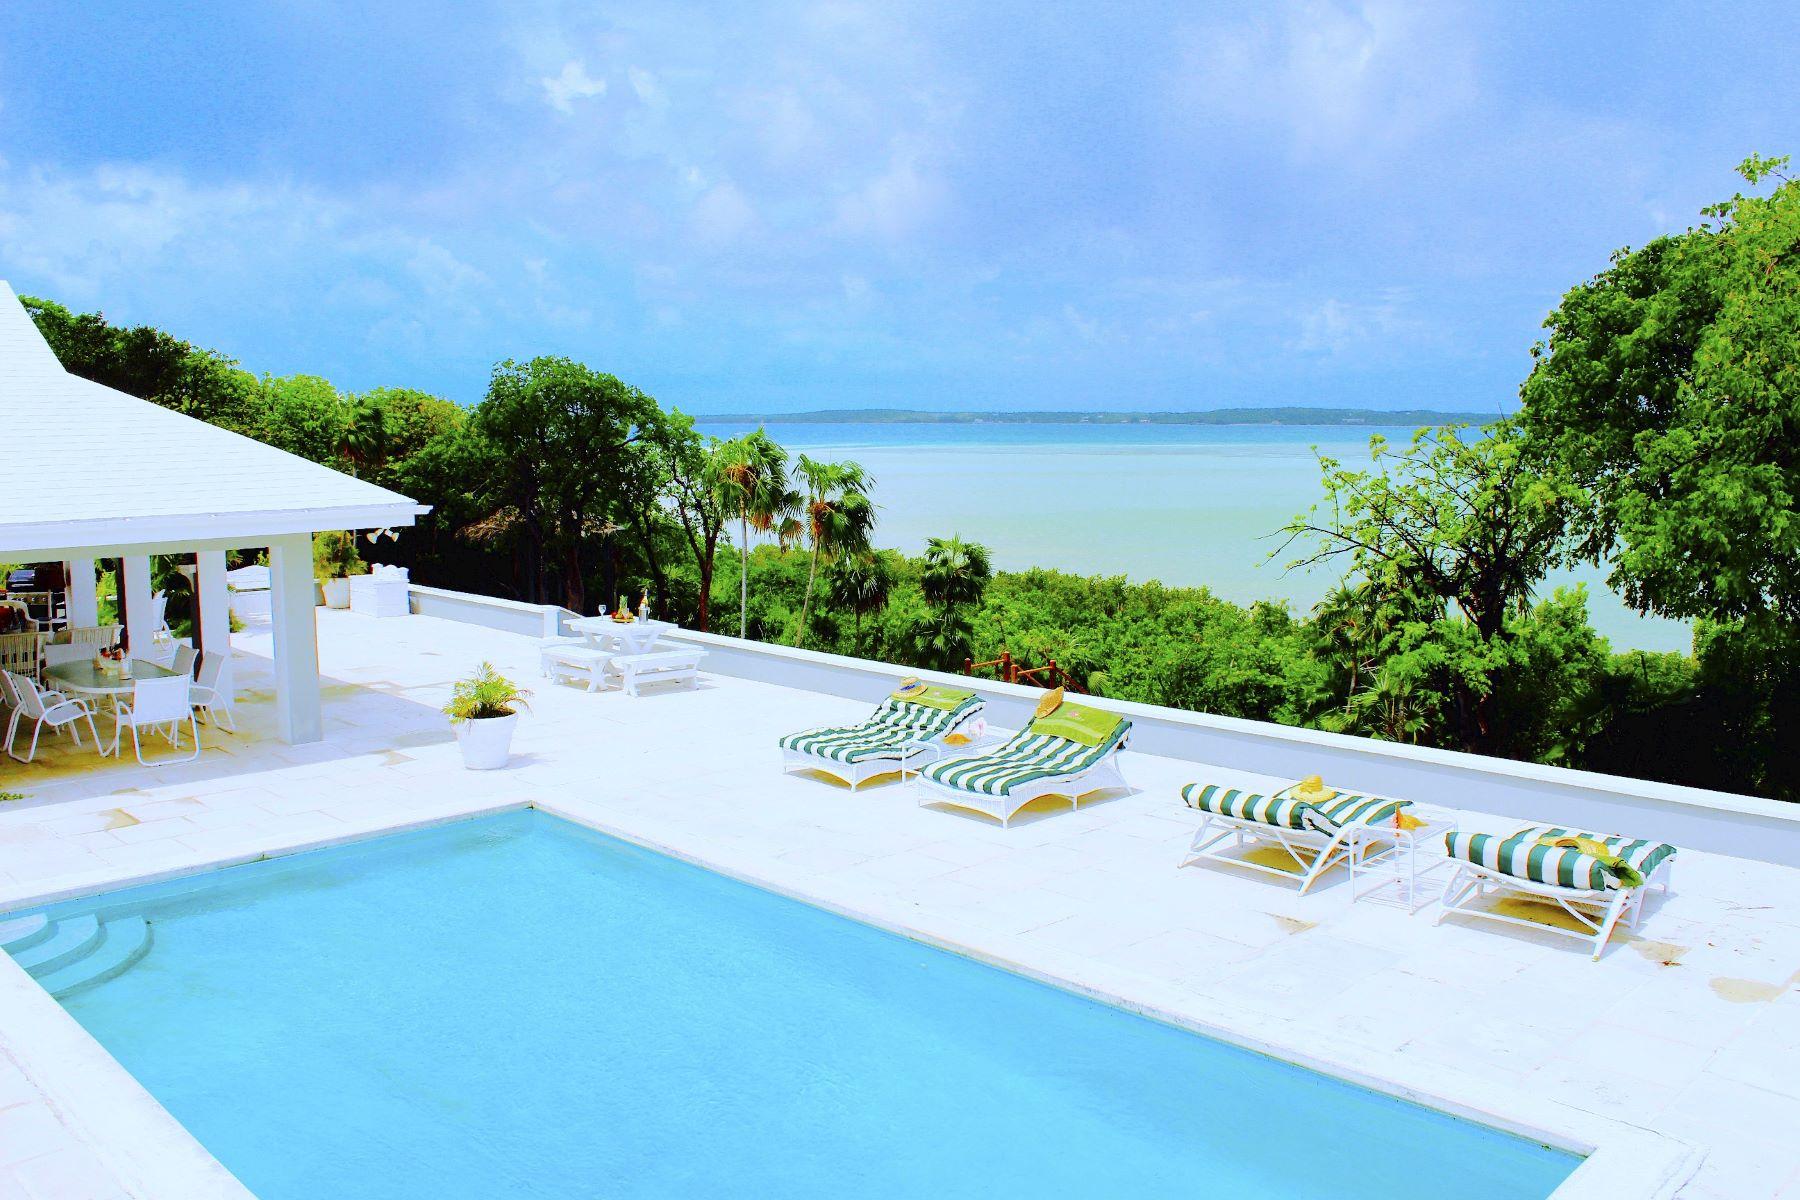 独户住宅 为 销售 在 GUMELEMI BLUFF Harbour Estate Harbour Island, 伊路瑟拉 巴哈马